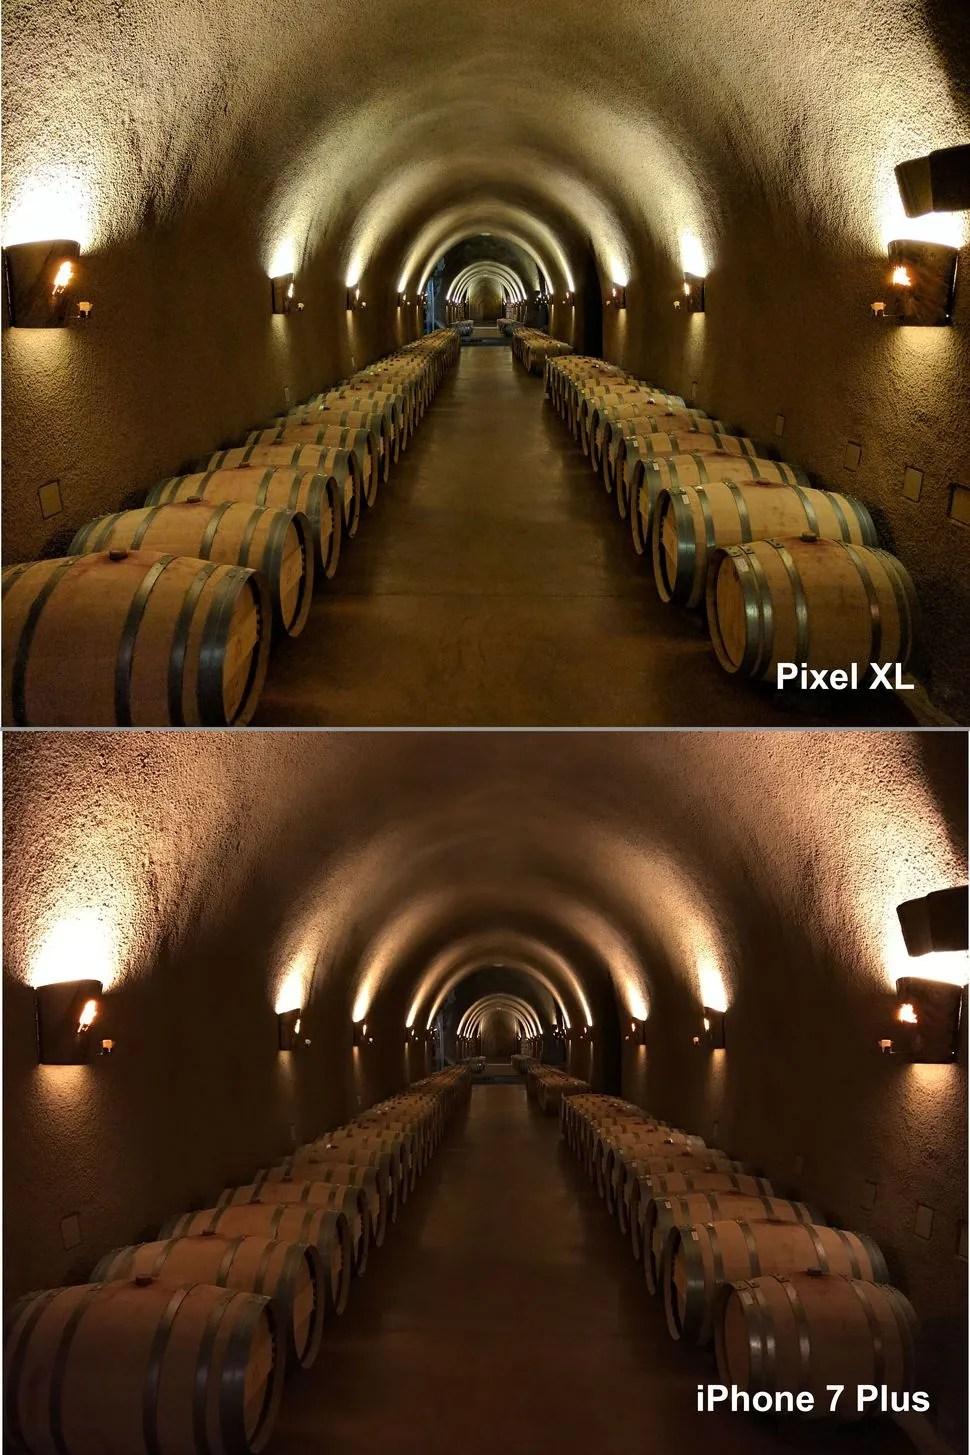 pixel-xl-vs-iphone-7-plus-low-light